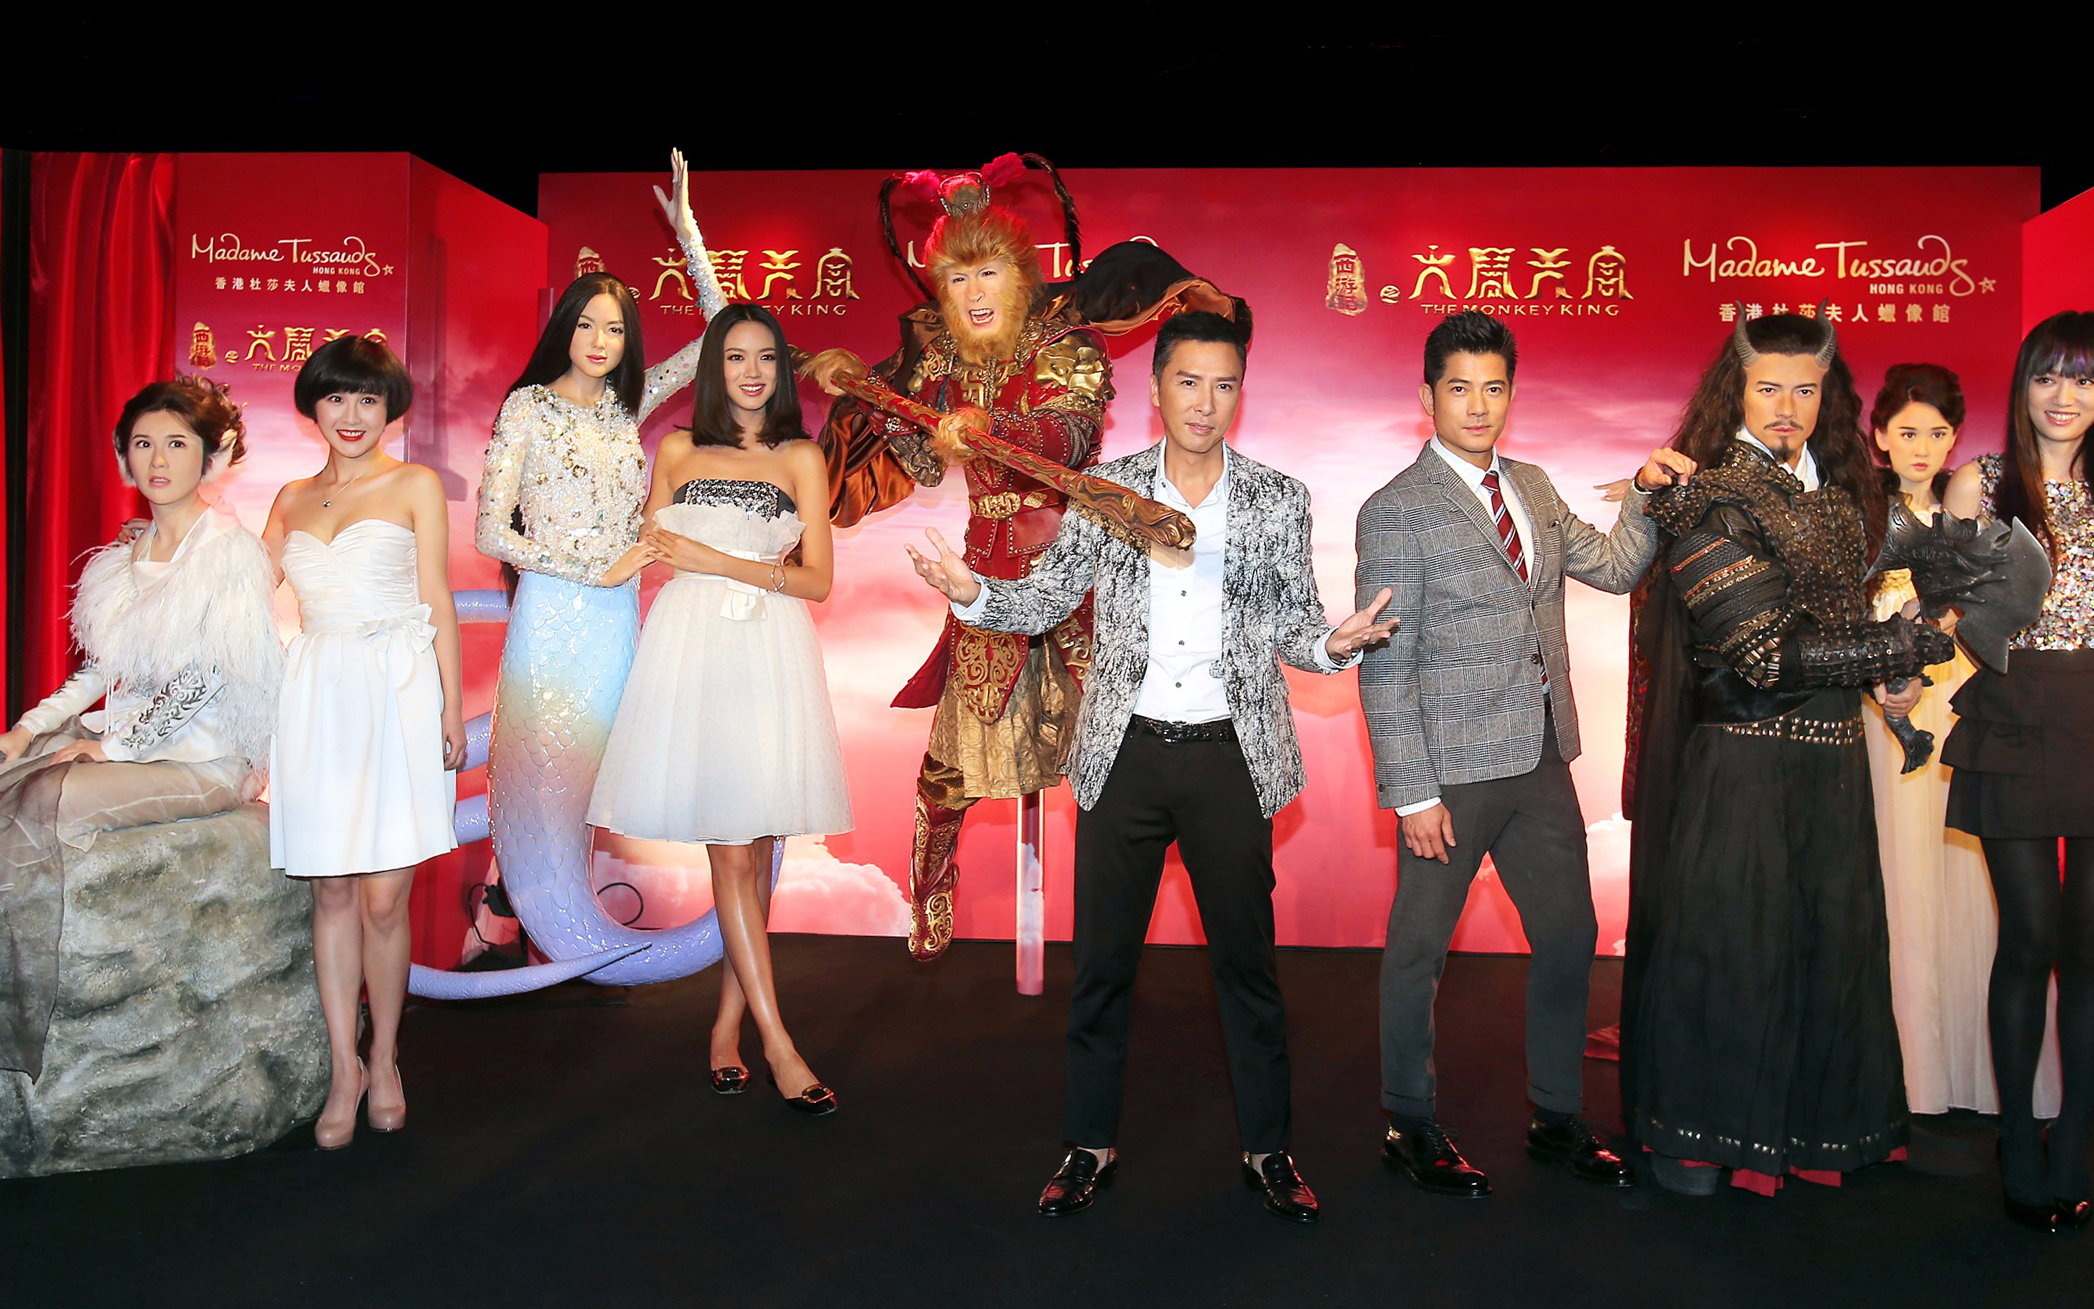 Hong Kong Disneyland Tickets Tours Deals Headout Tiket Madame Tussauds Singapore